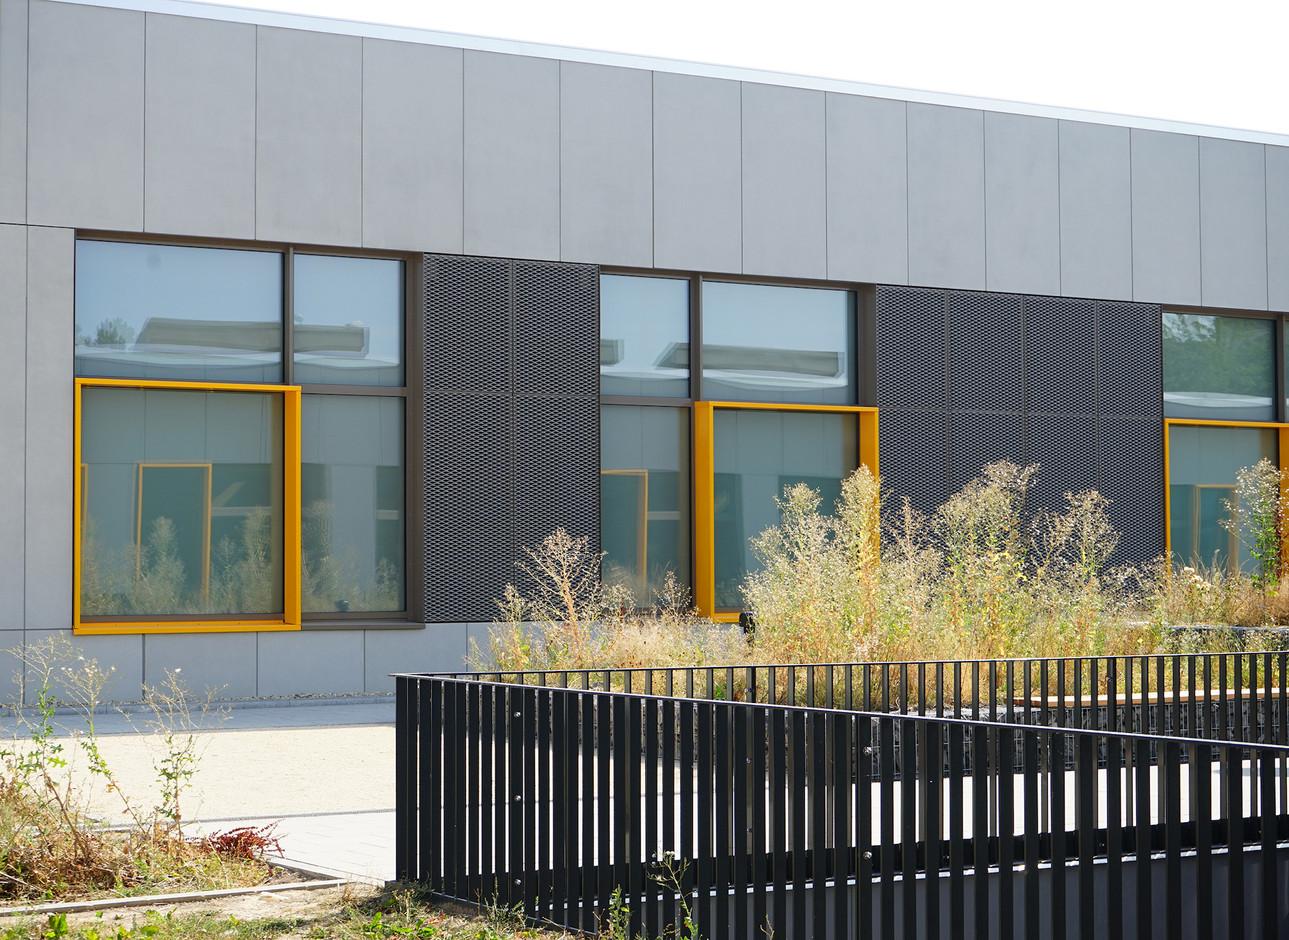 The yellow window frames form a visual signature.                      (Decker, Lammar & Associates)